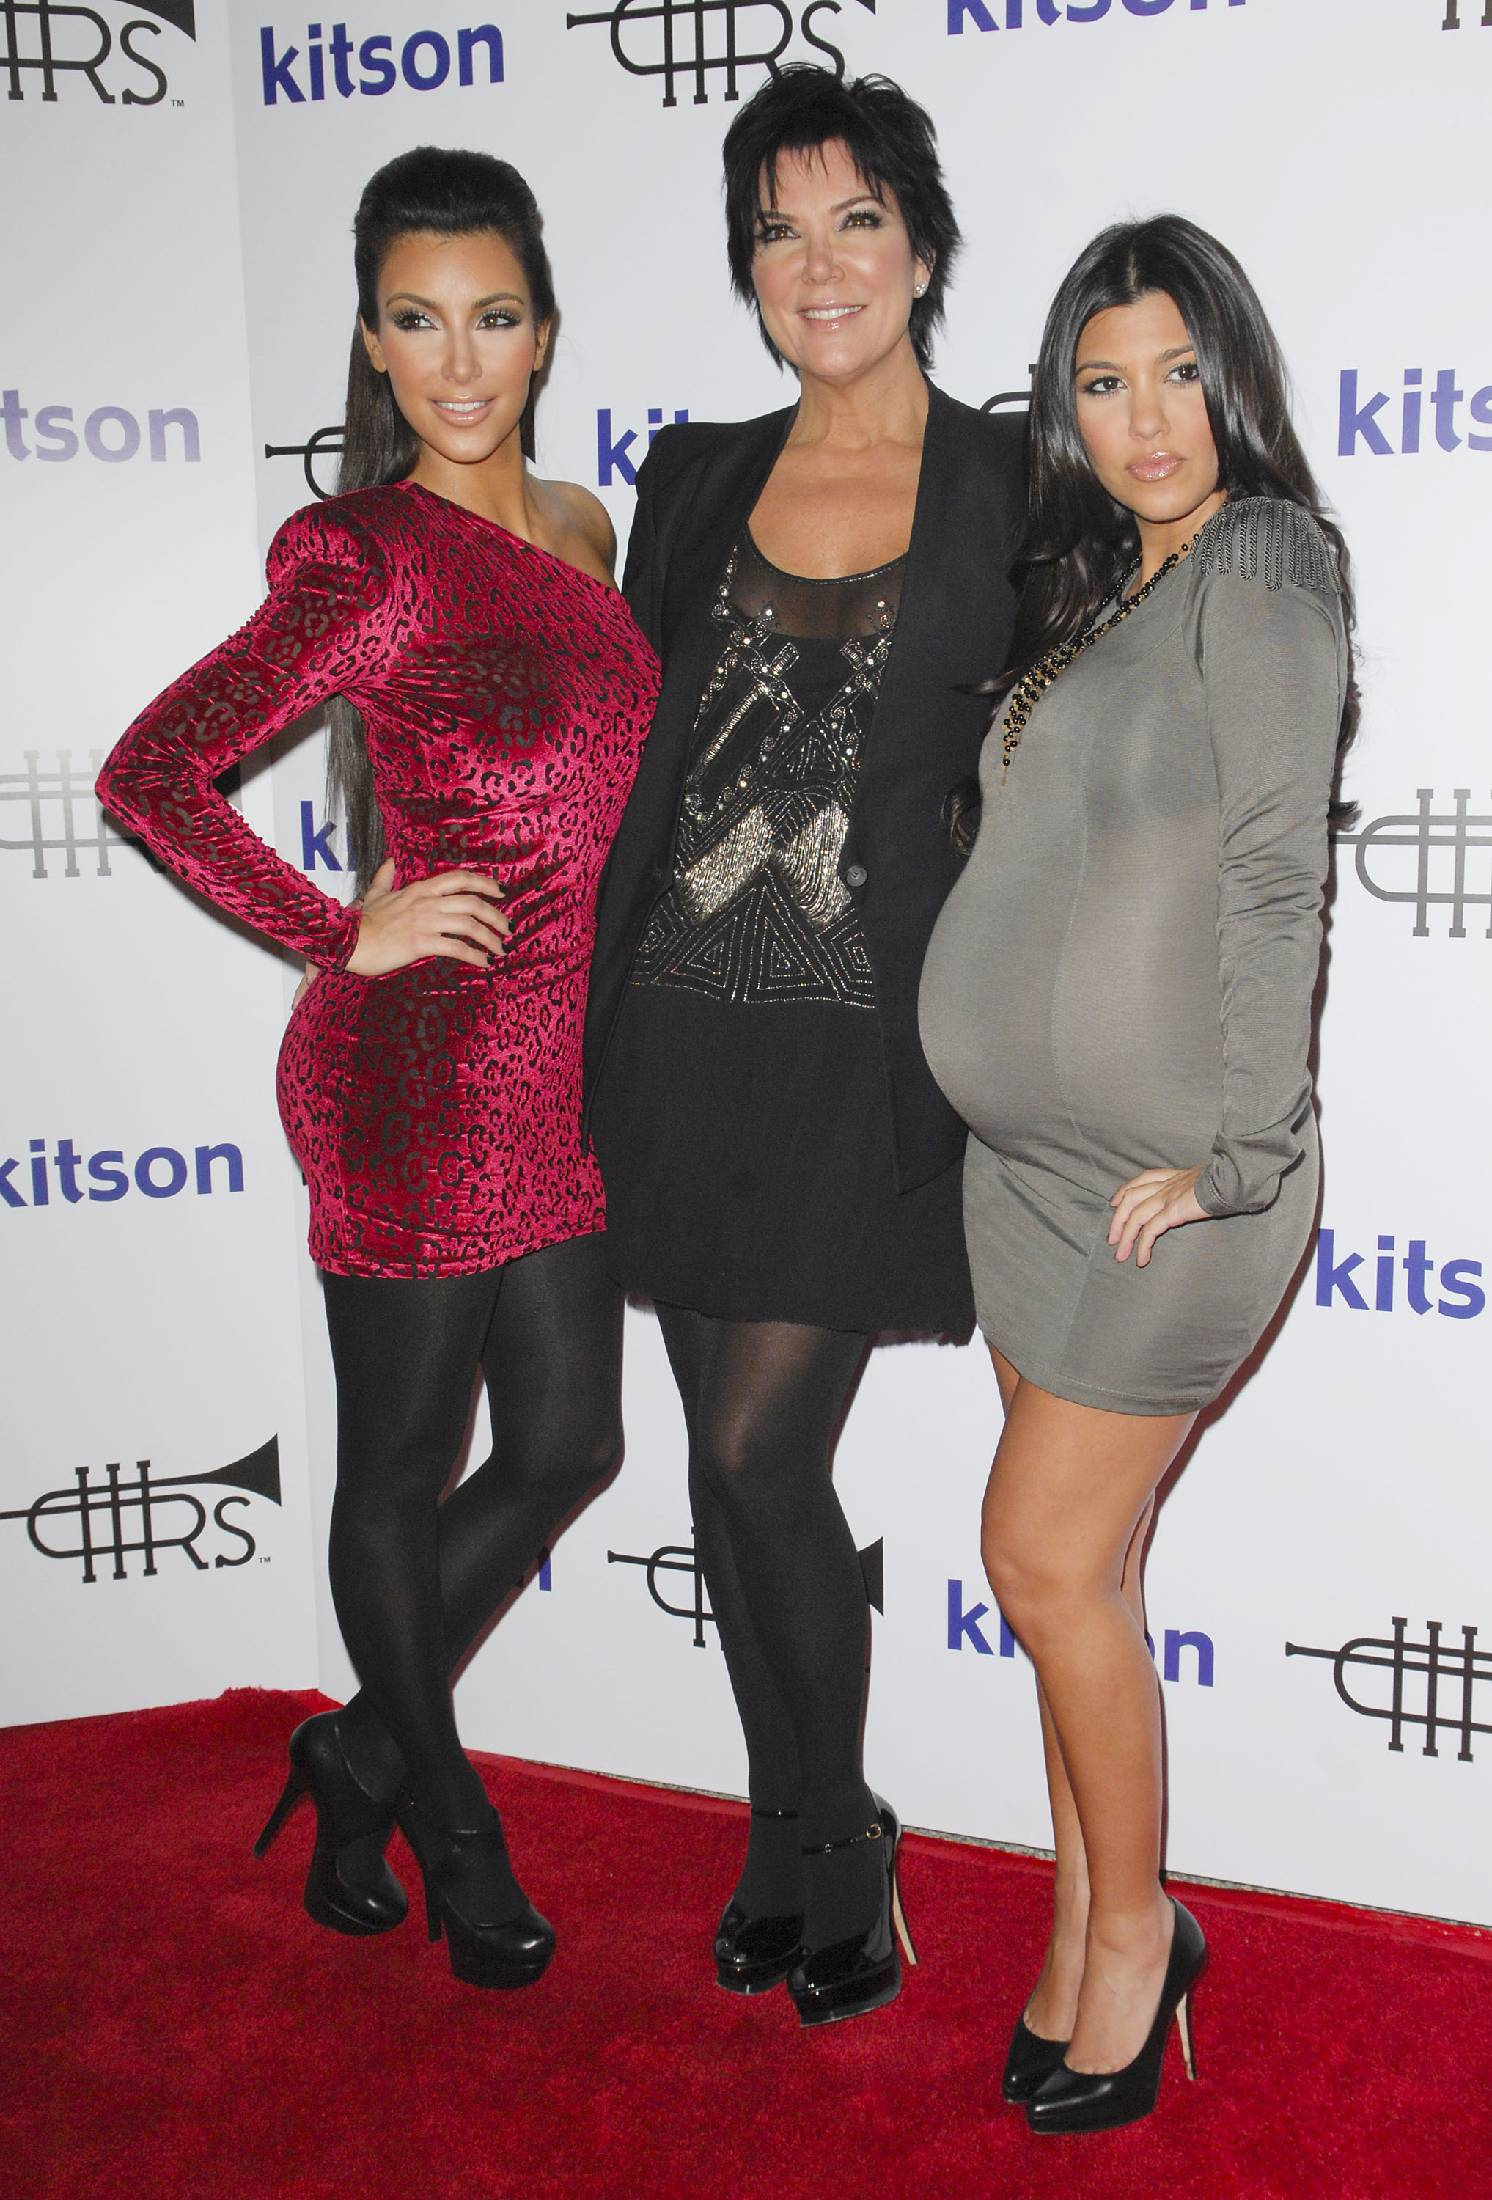 44964_Kim_Kardashian_01_122_227lo.jpg